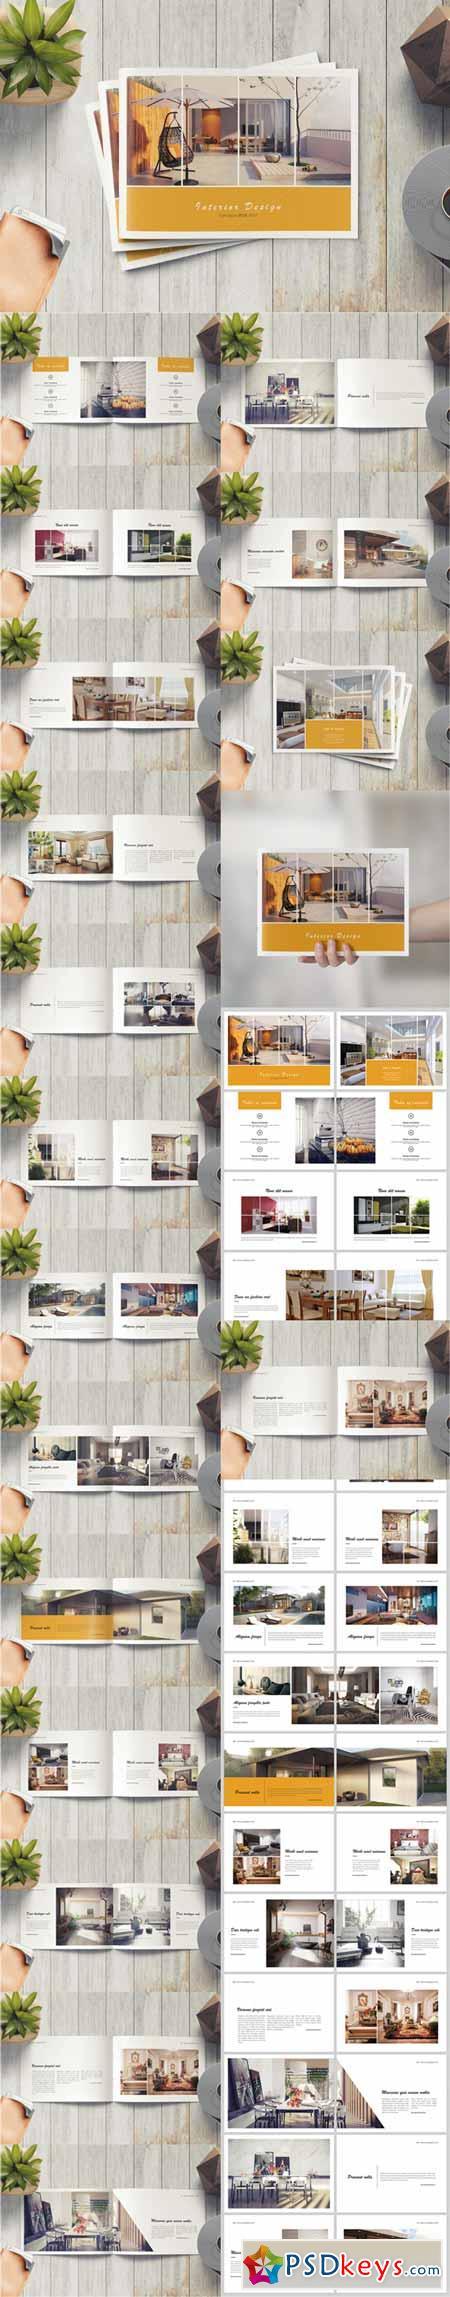 Minimal Product Catalog Brochure 584420